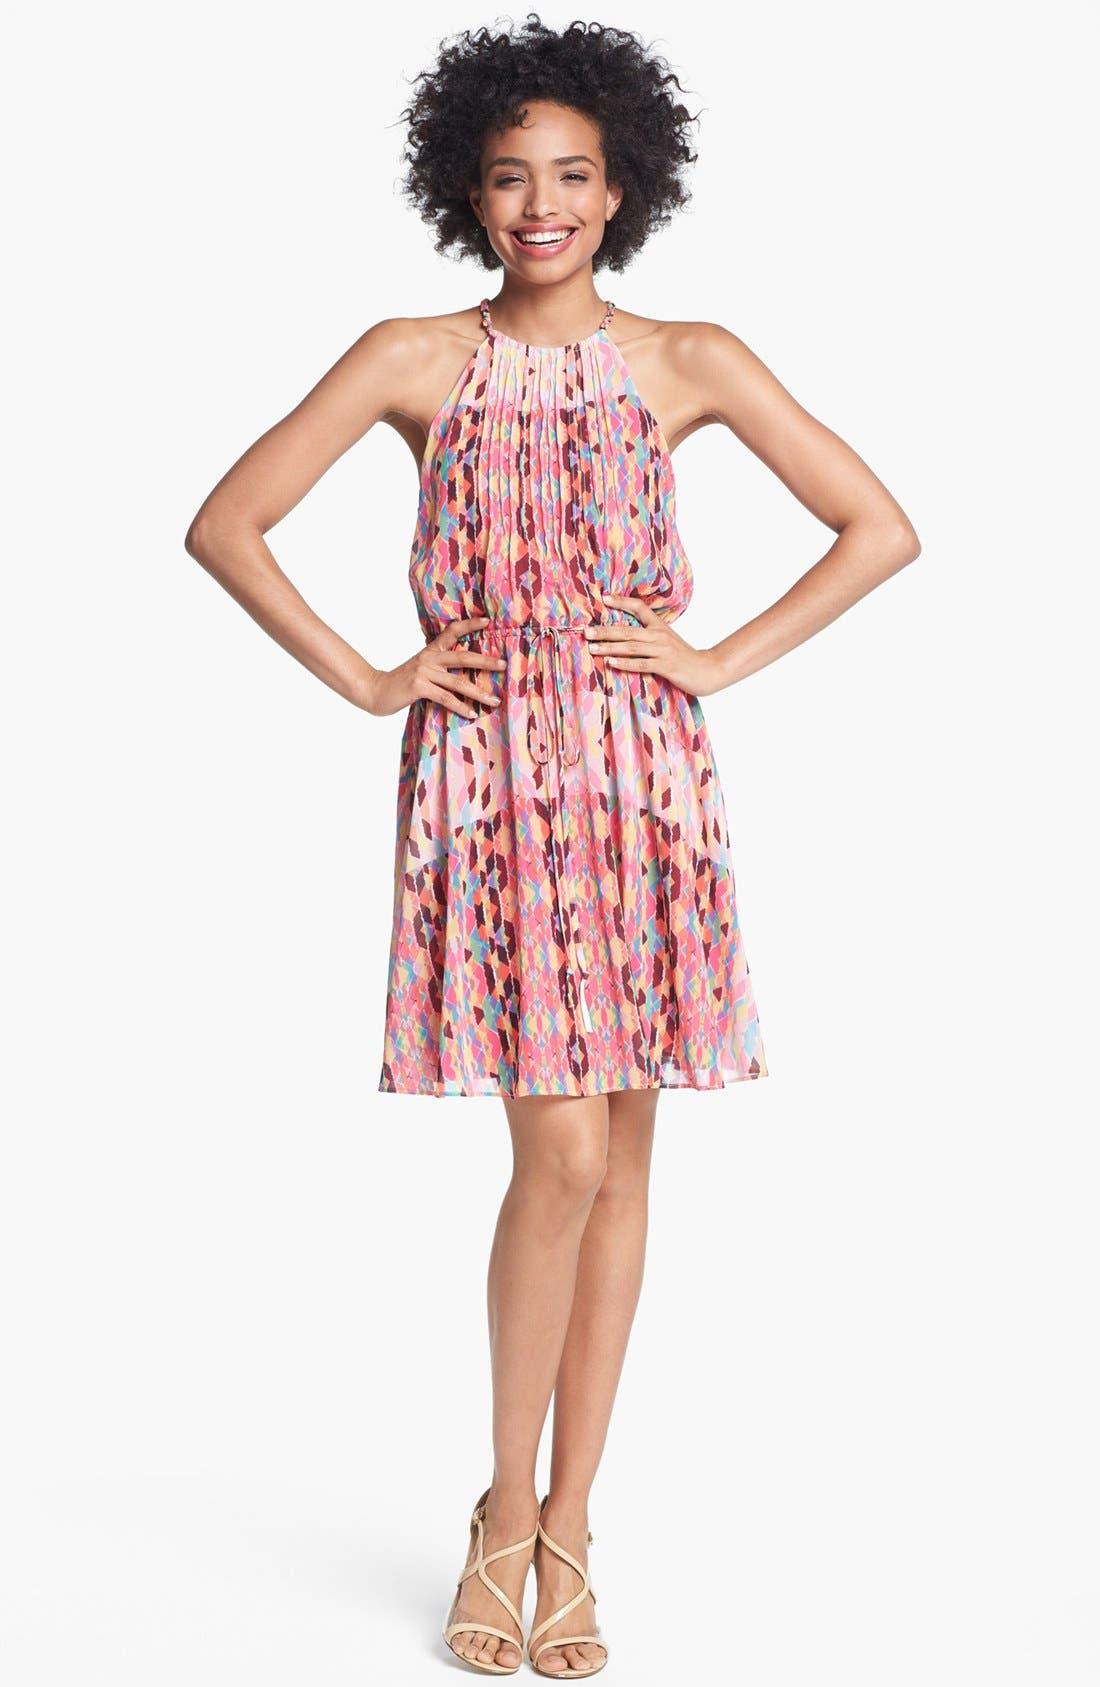 Main Image - Jessica Simpson Print Pintucked Chiffon Dress